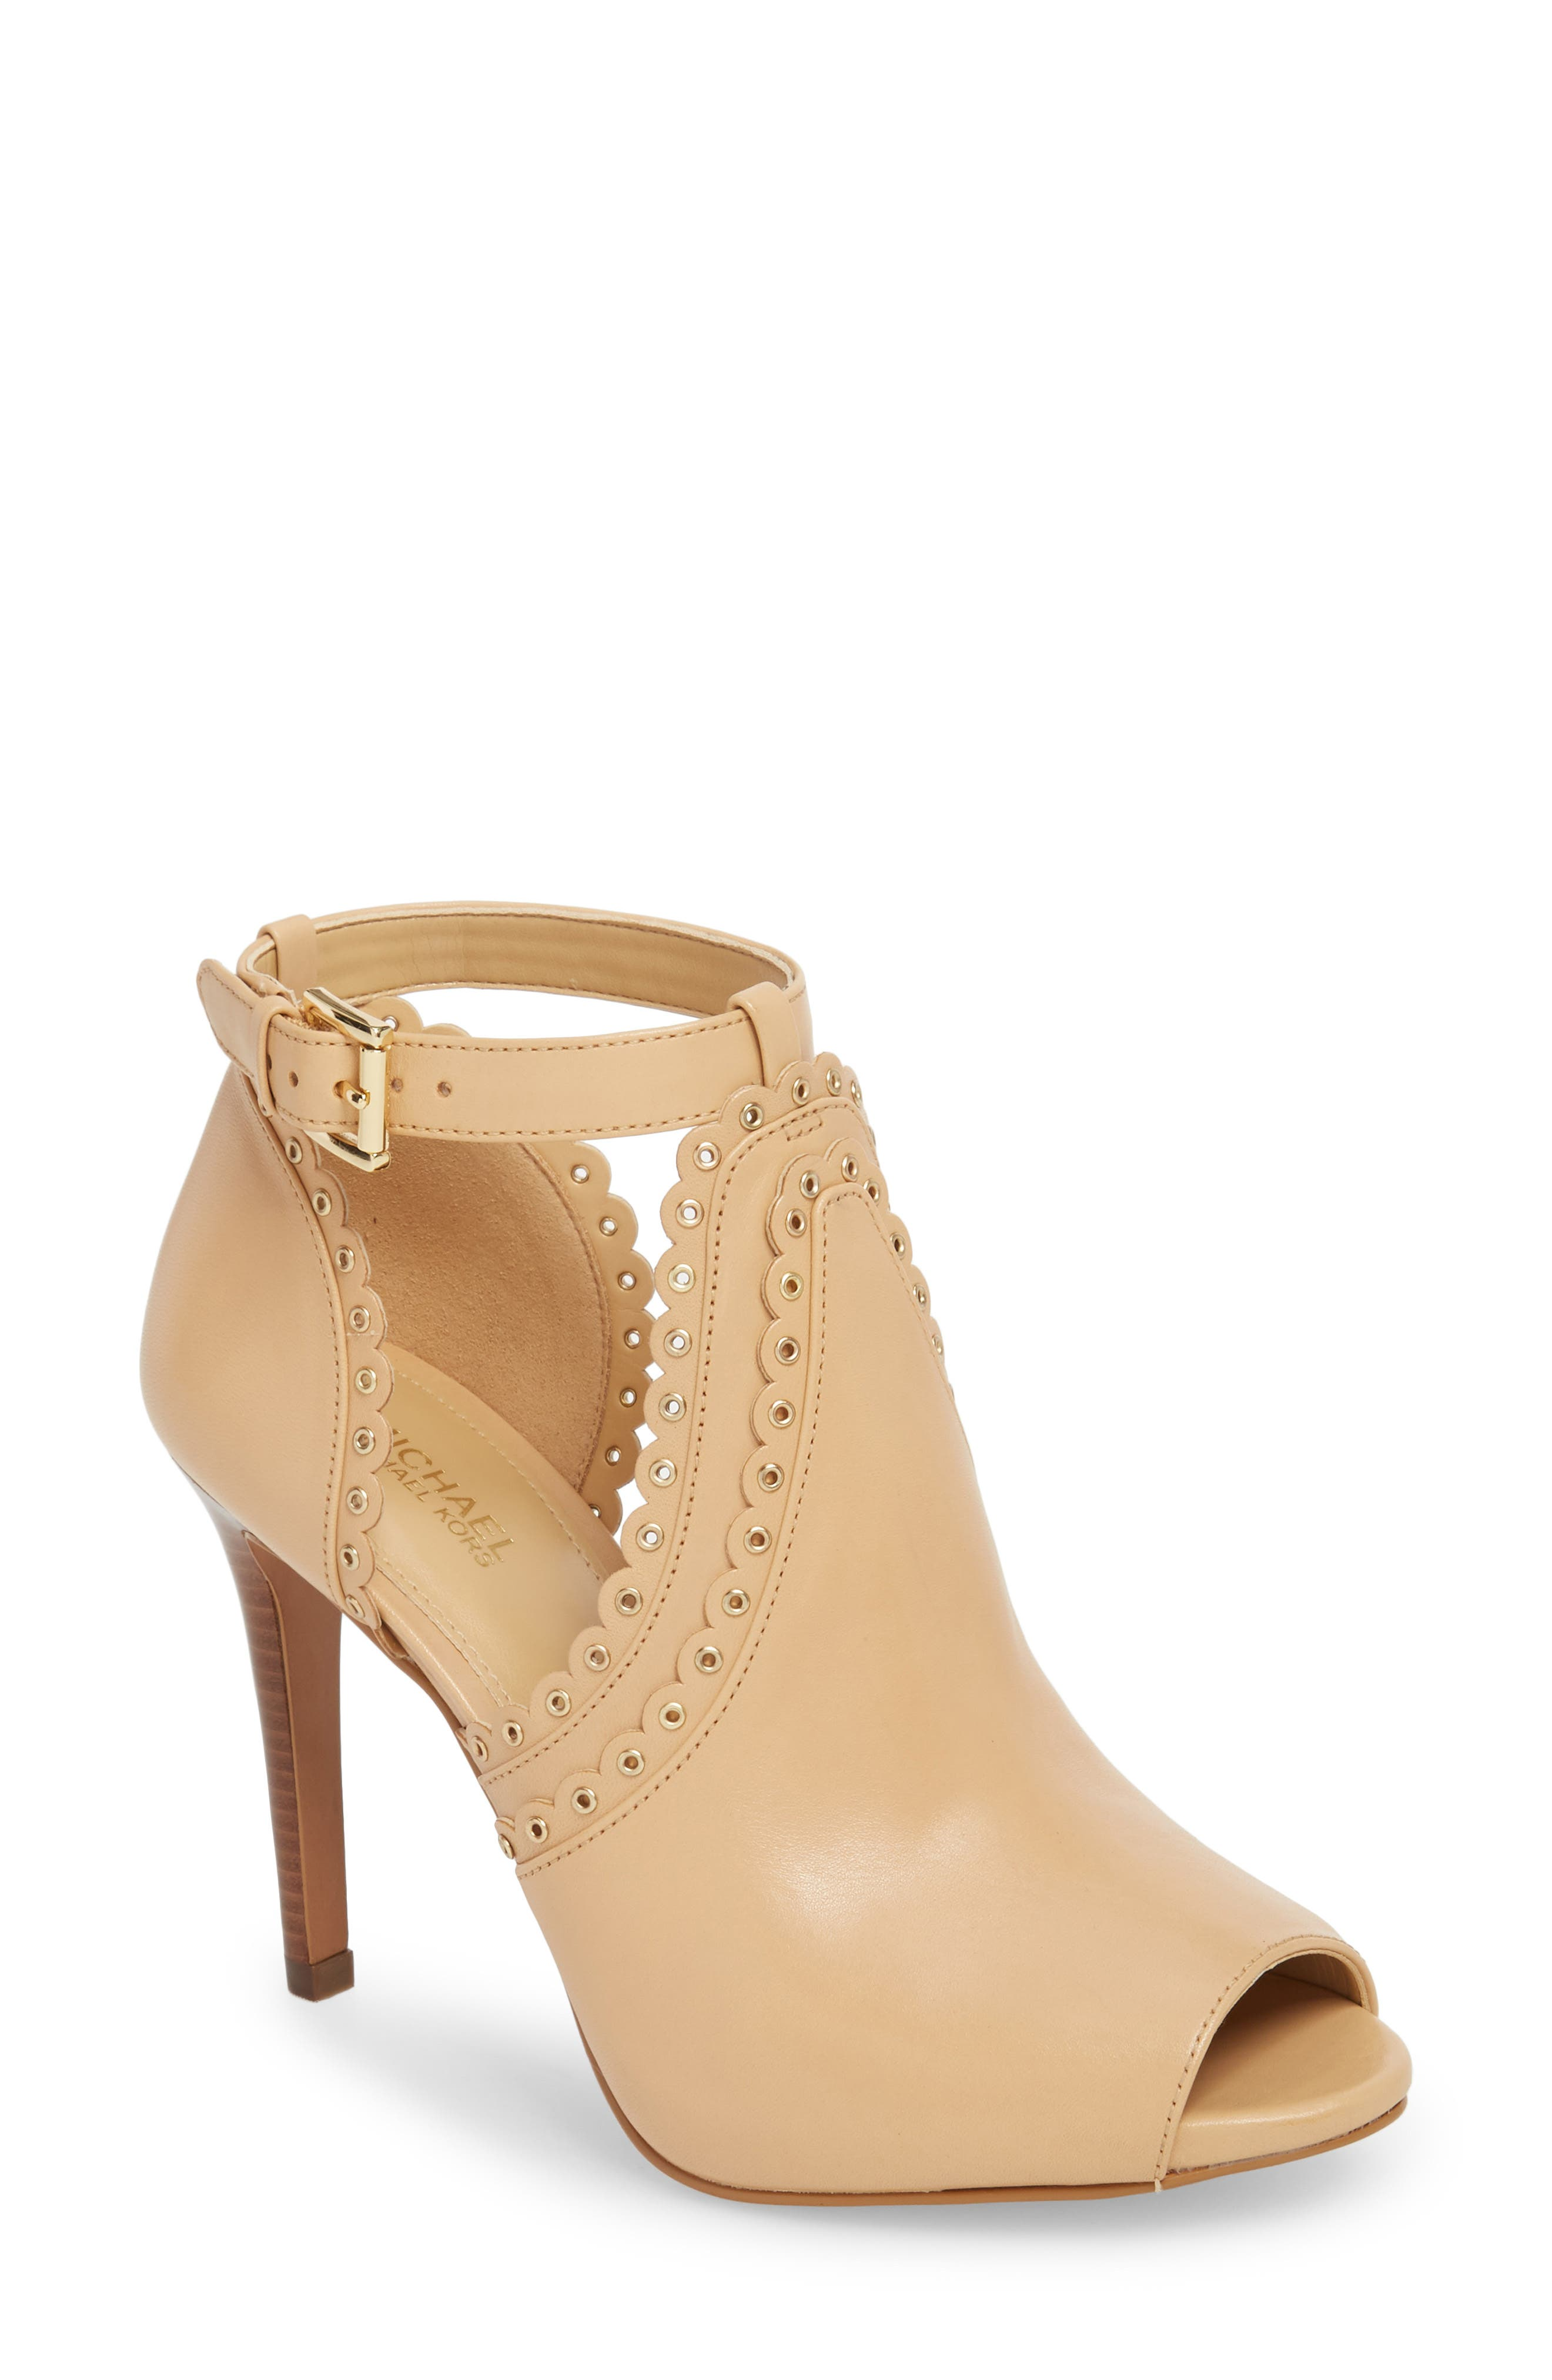 Jessie Ankle Strap Sandal,                         Main,                         color, BUTTERNUT LEATHER